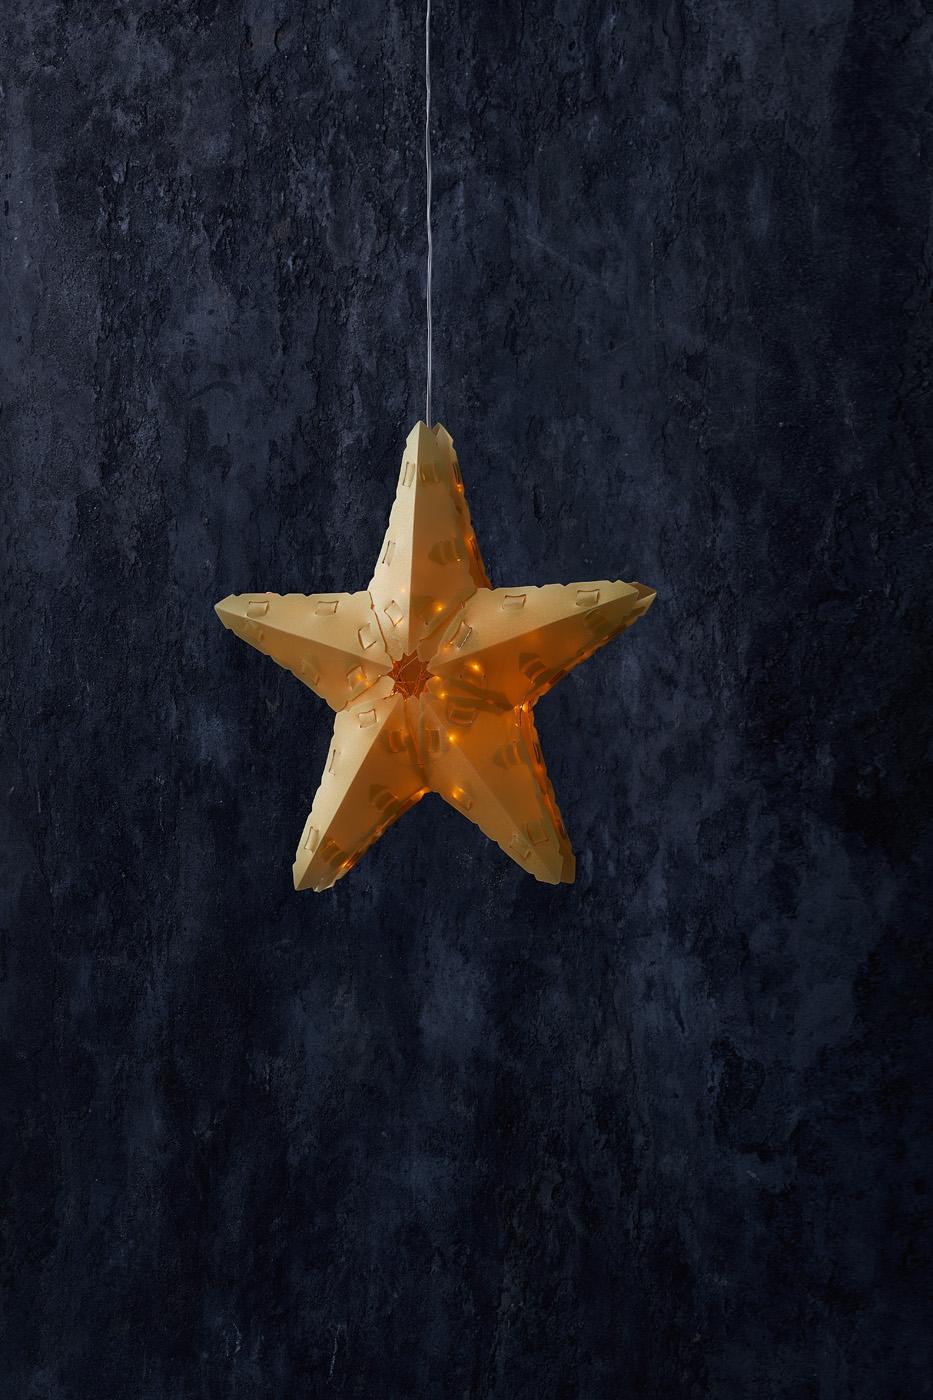 CREATTO_CHRISTMAS_LINE_GOLDEN_STAR_5.jpg